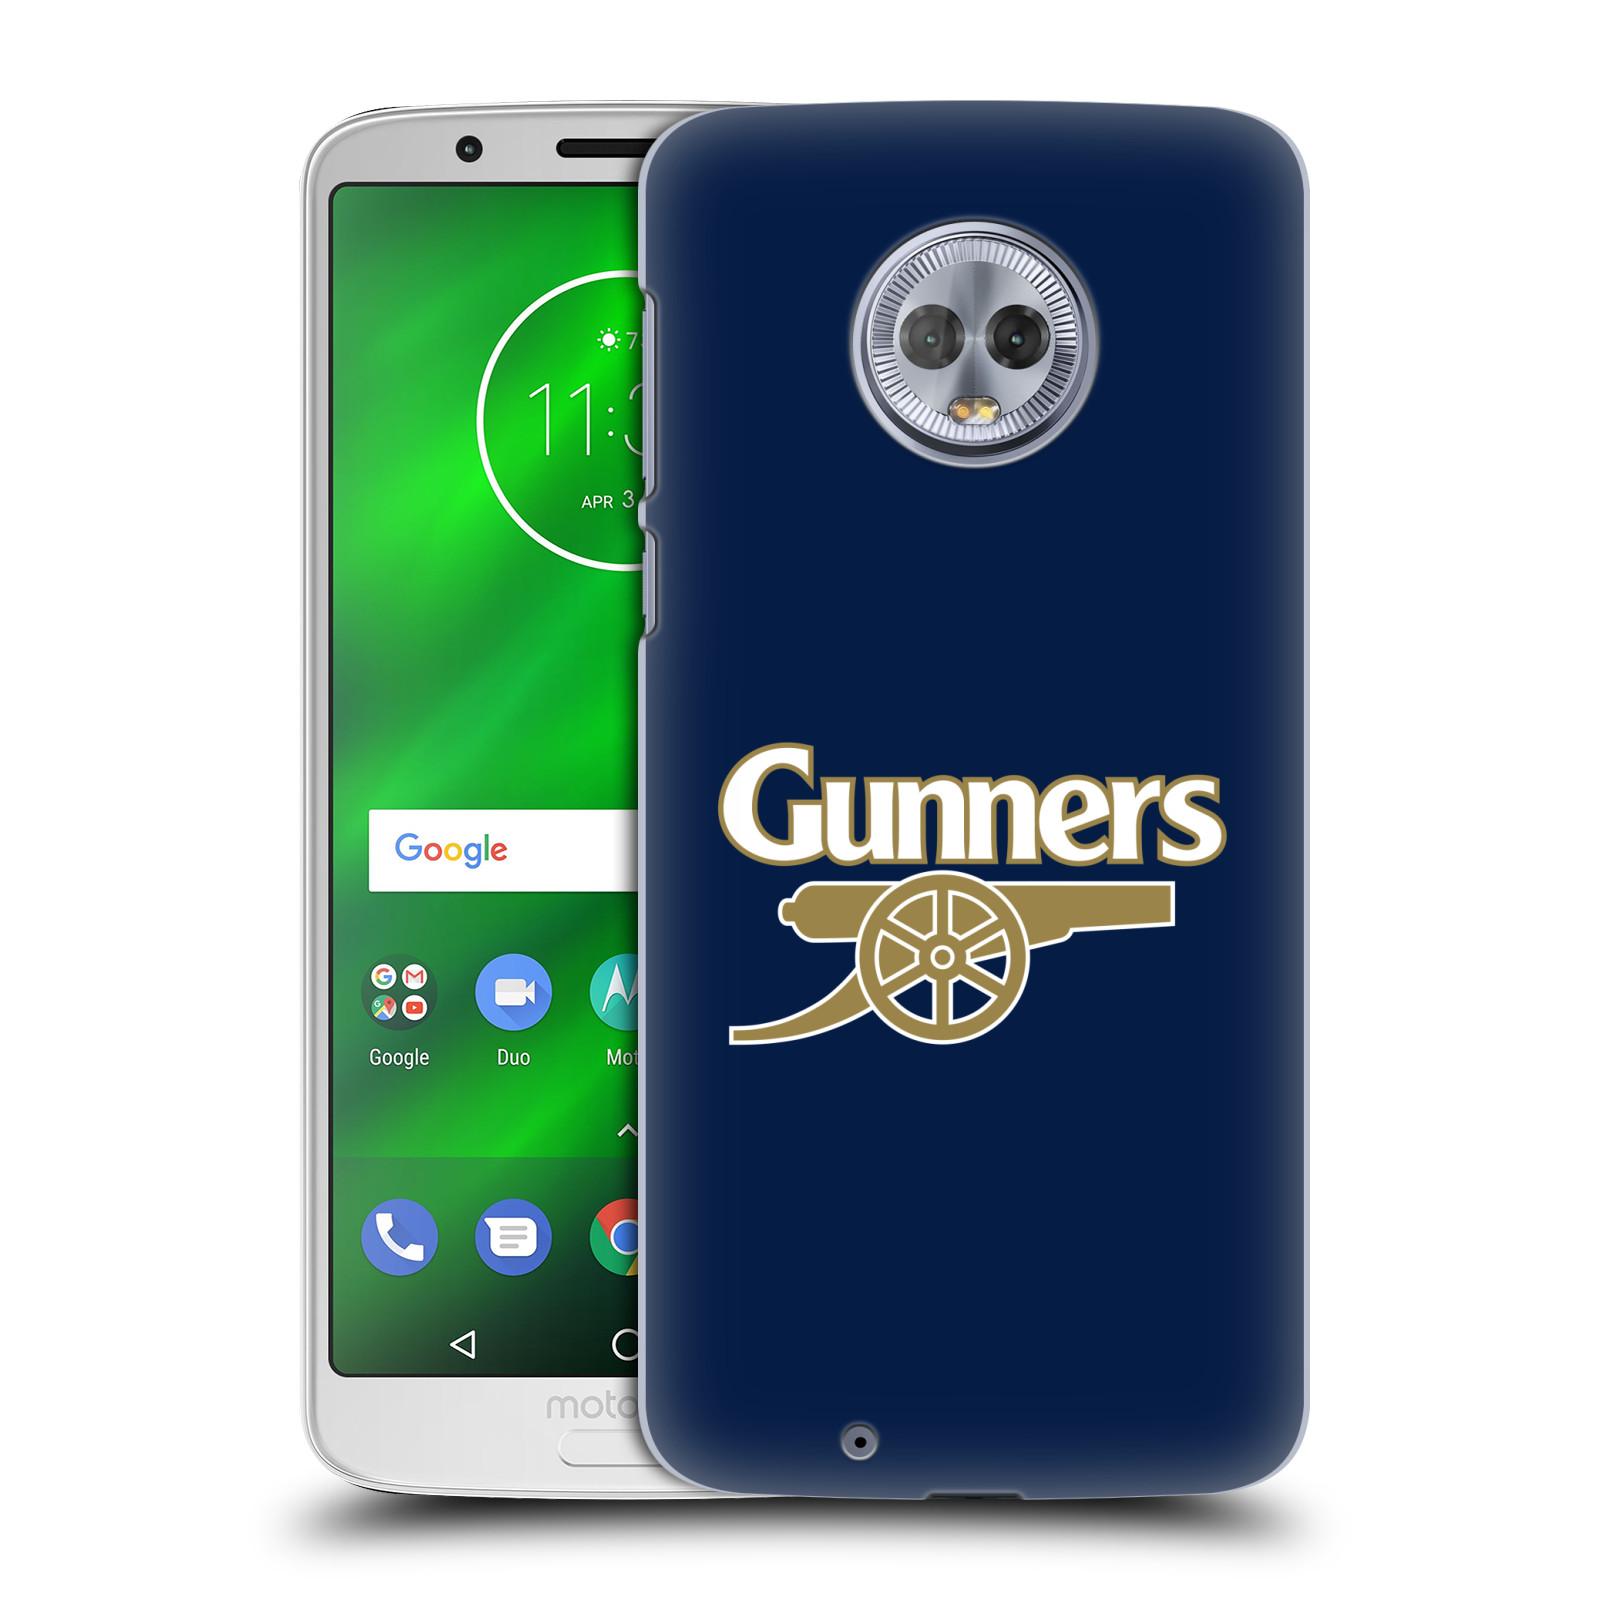 Plastové pouzdro na mobil Motorola Moto G6 - Head Case - Arsenal FC - Gunners